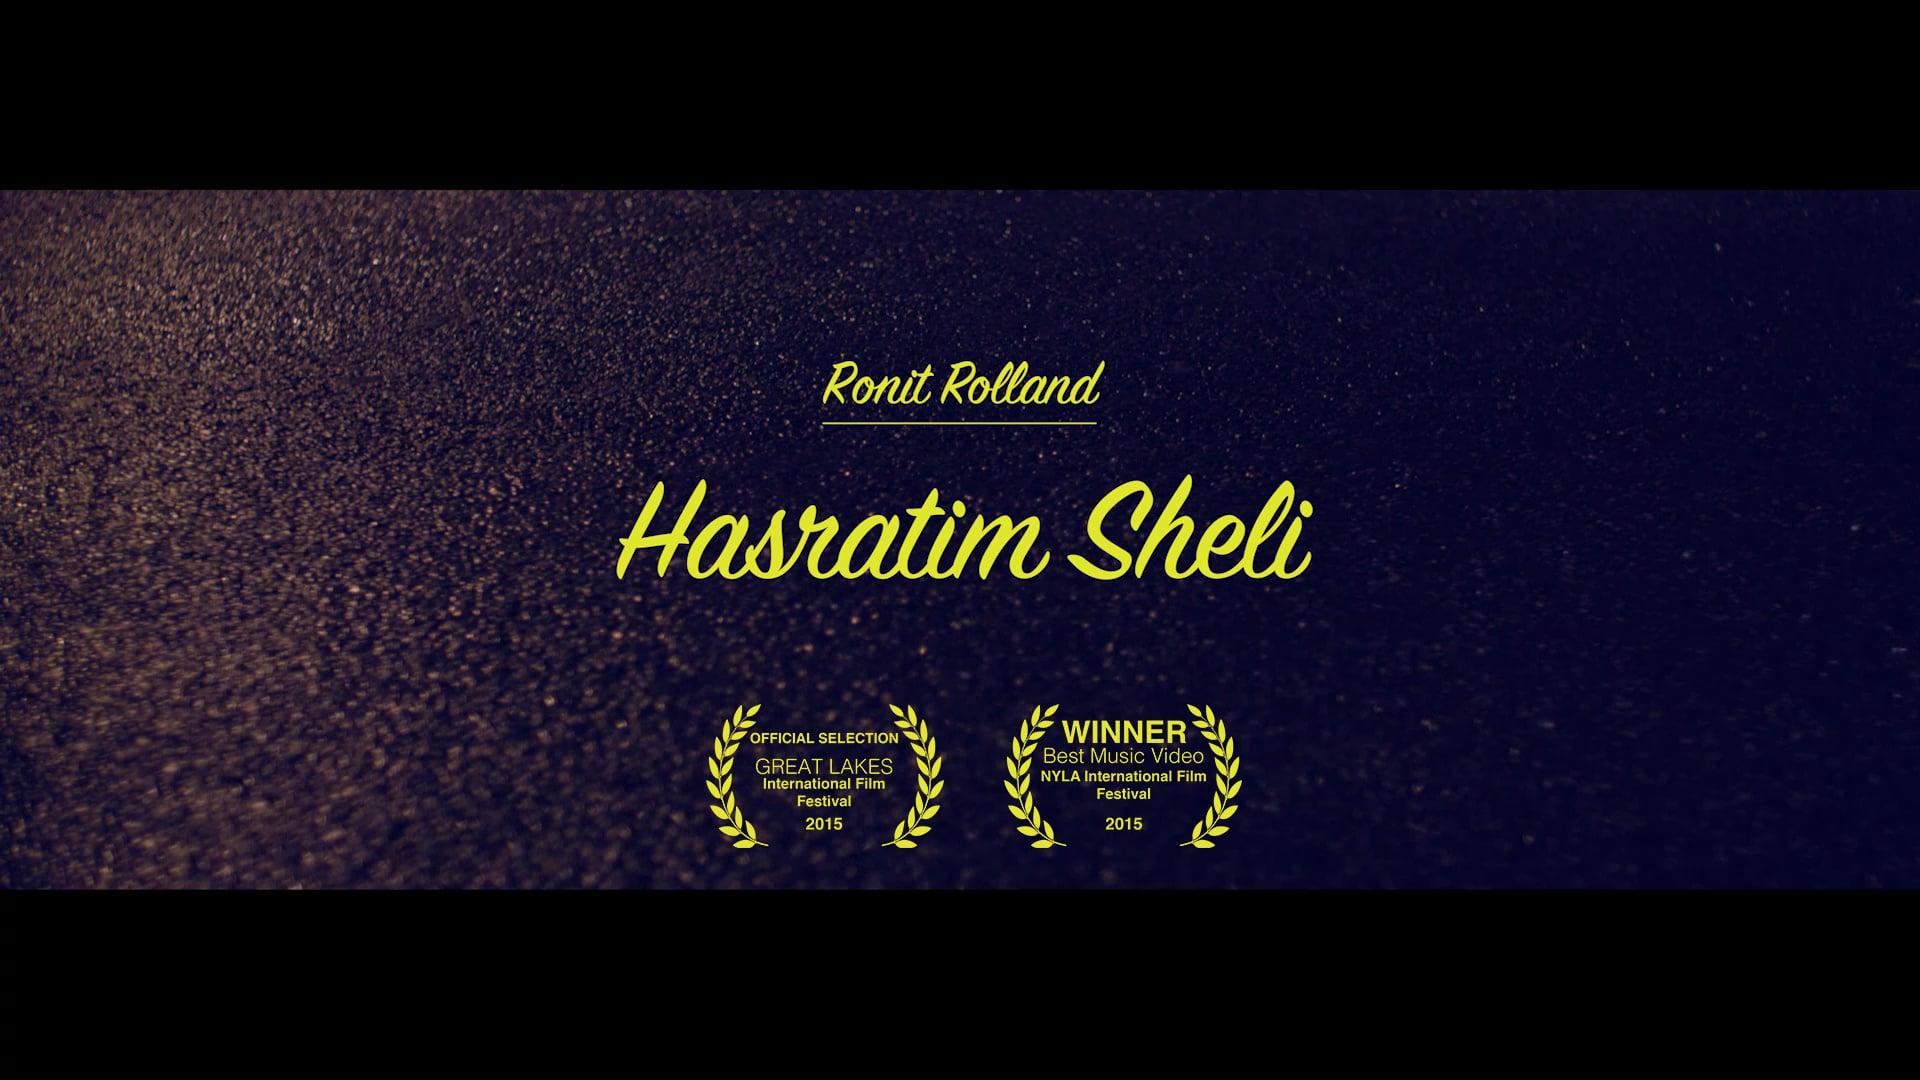 Ronit Rolland - Hasratim Sheli